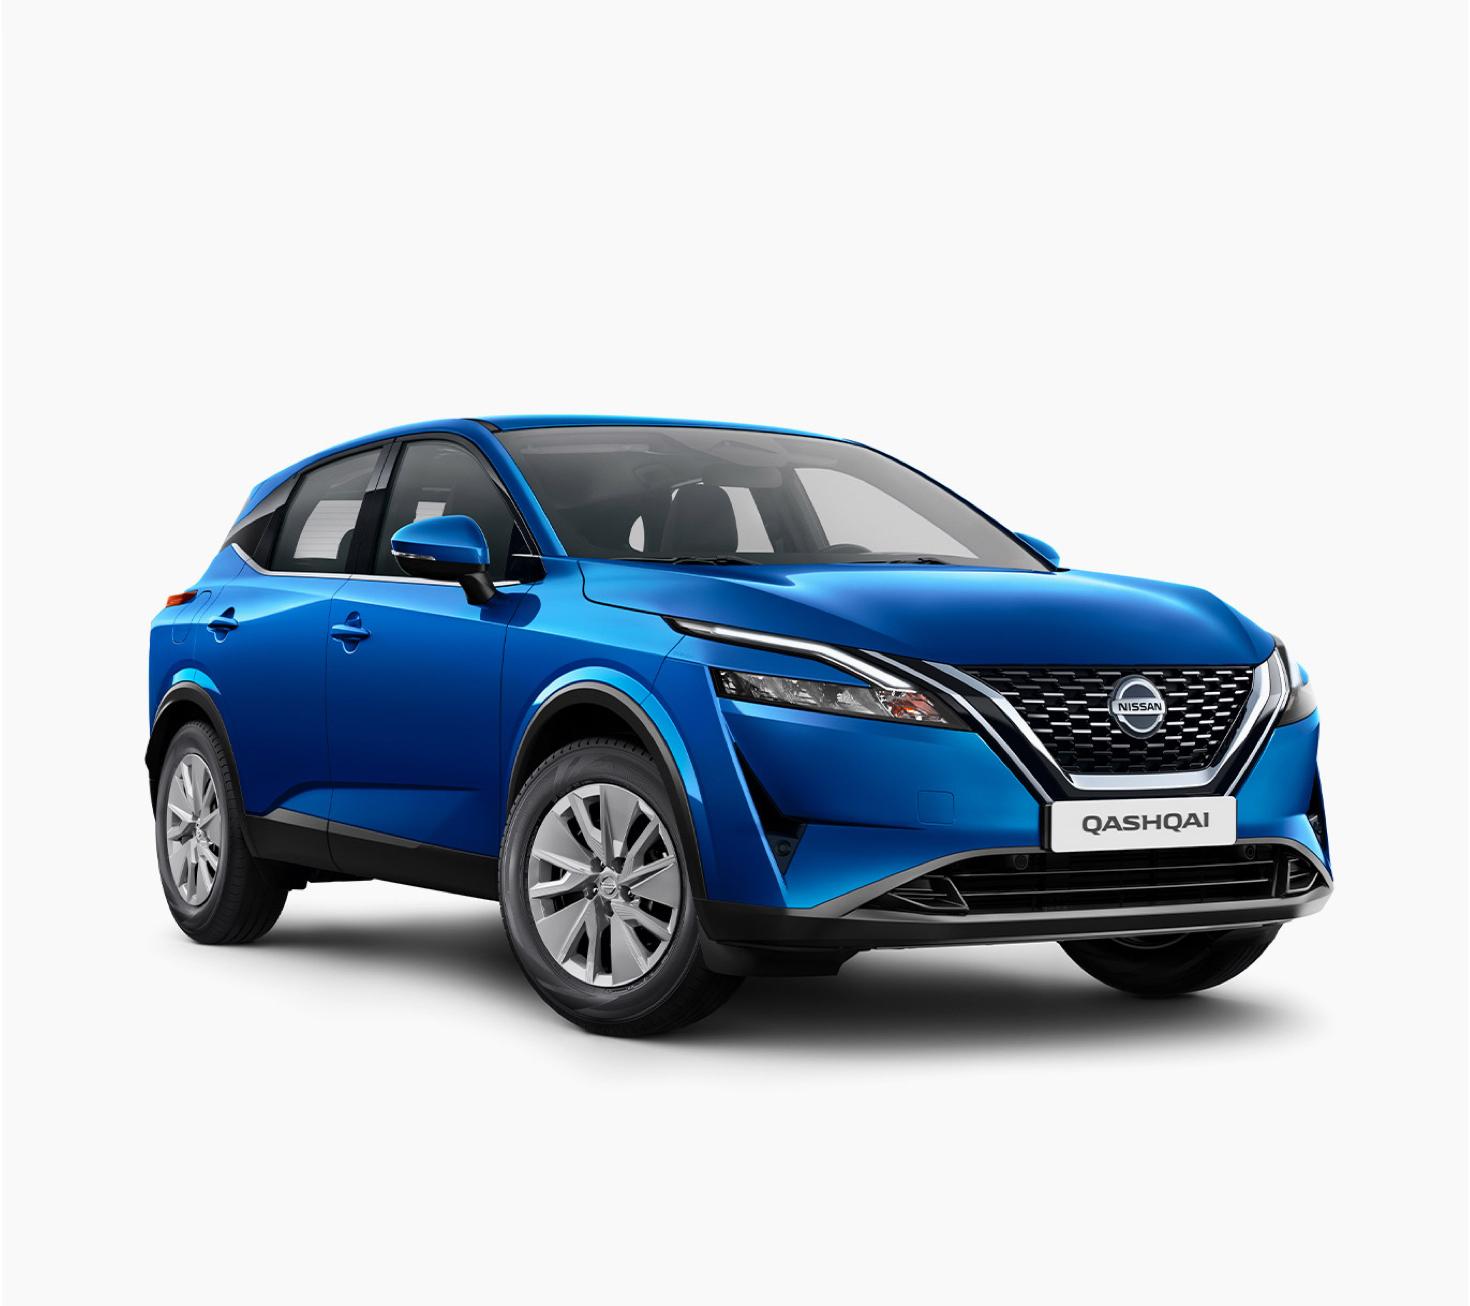 Nissan new Qashqai Visia 3/4 front